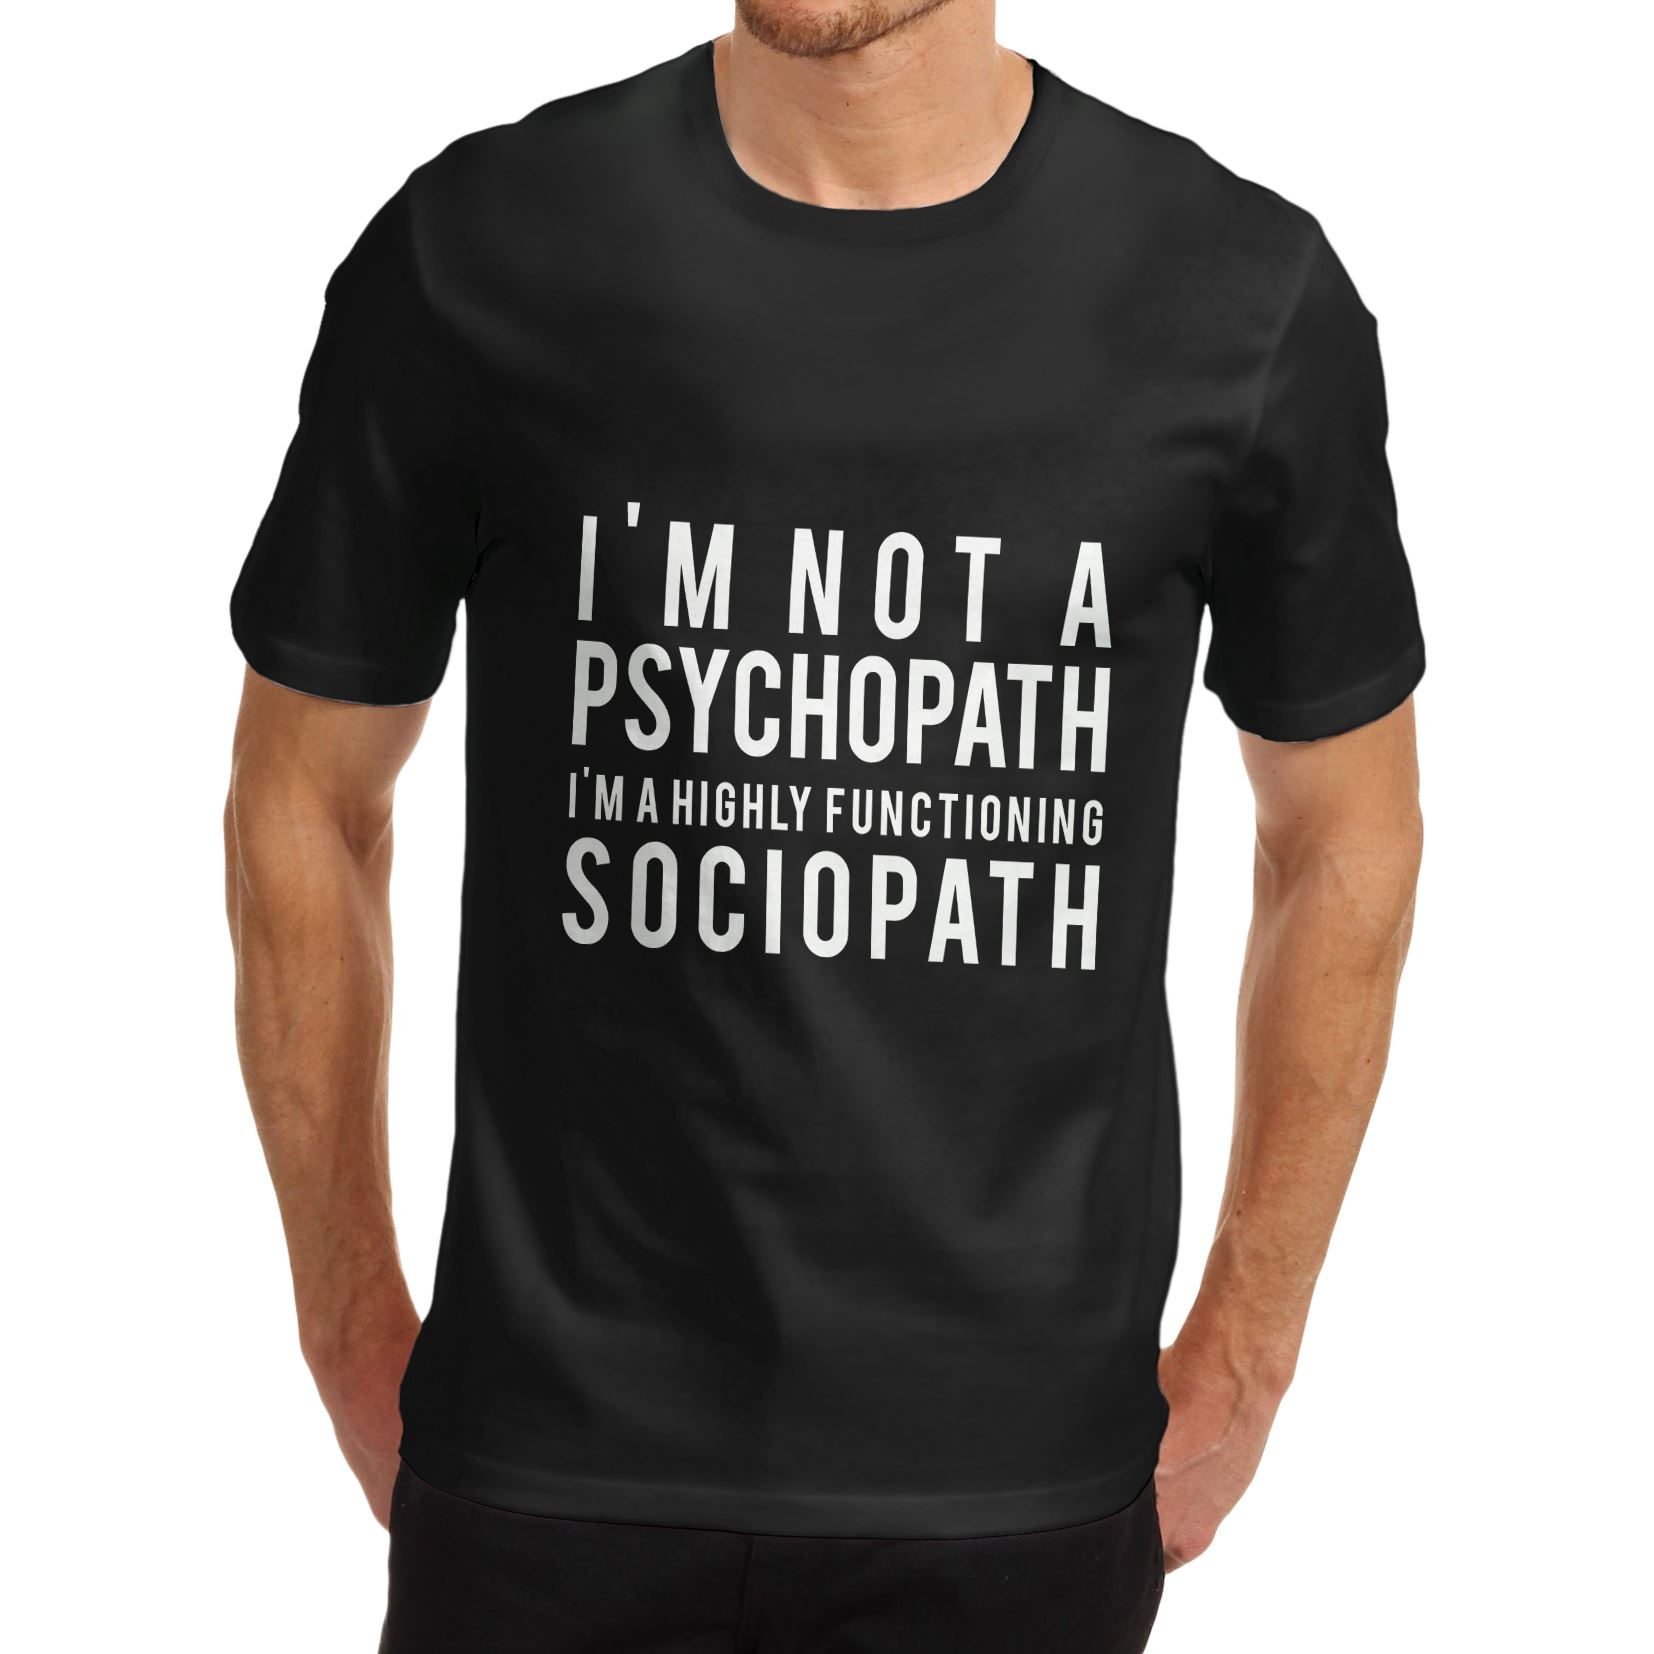 Im black t shirt - Men S T Shirt 2016 Newest Men S Funny I M Not A Psychopath Joke T Shirt Black Medium 2016 New 100 Cotton T Shirts Men